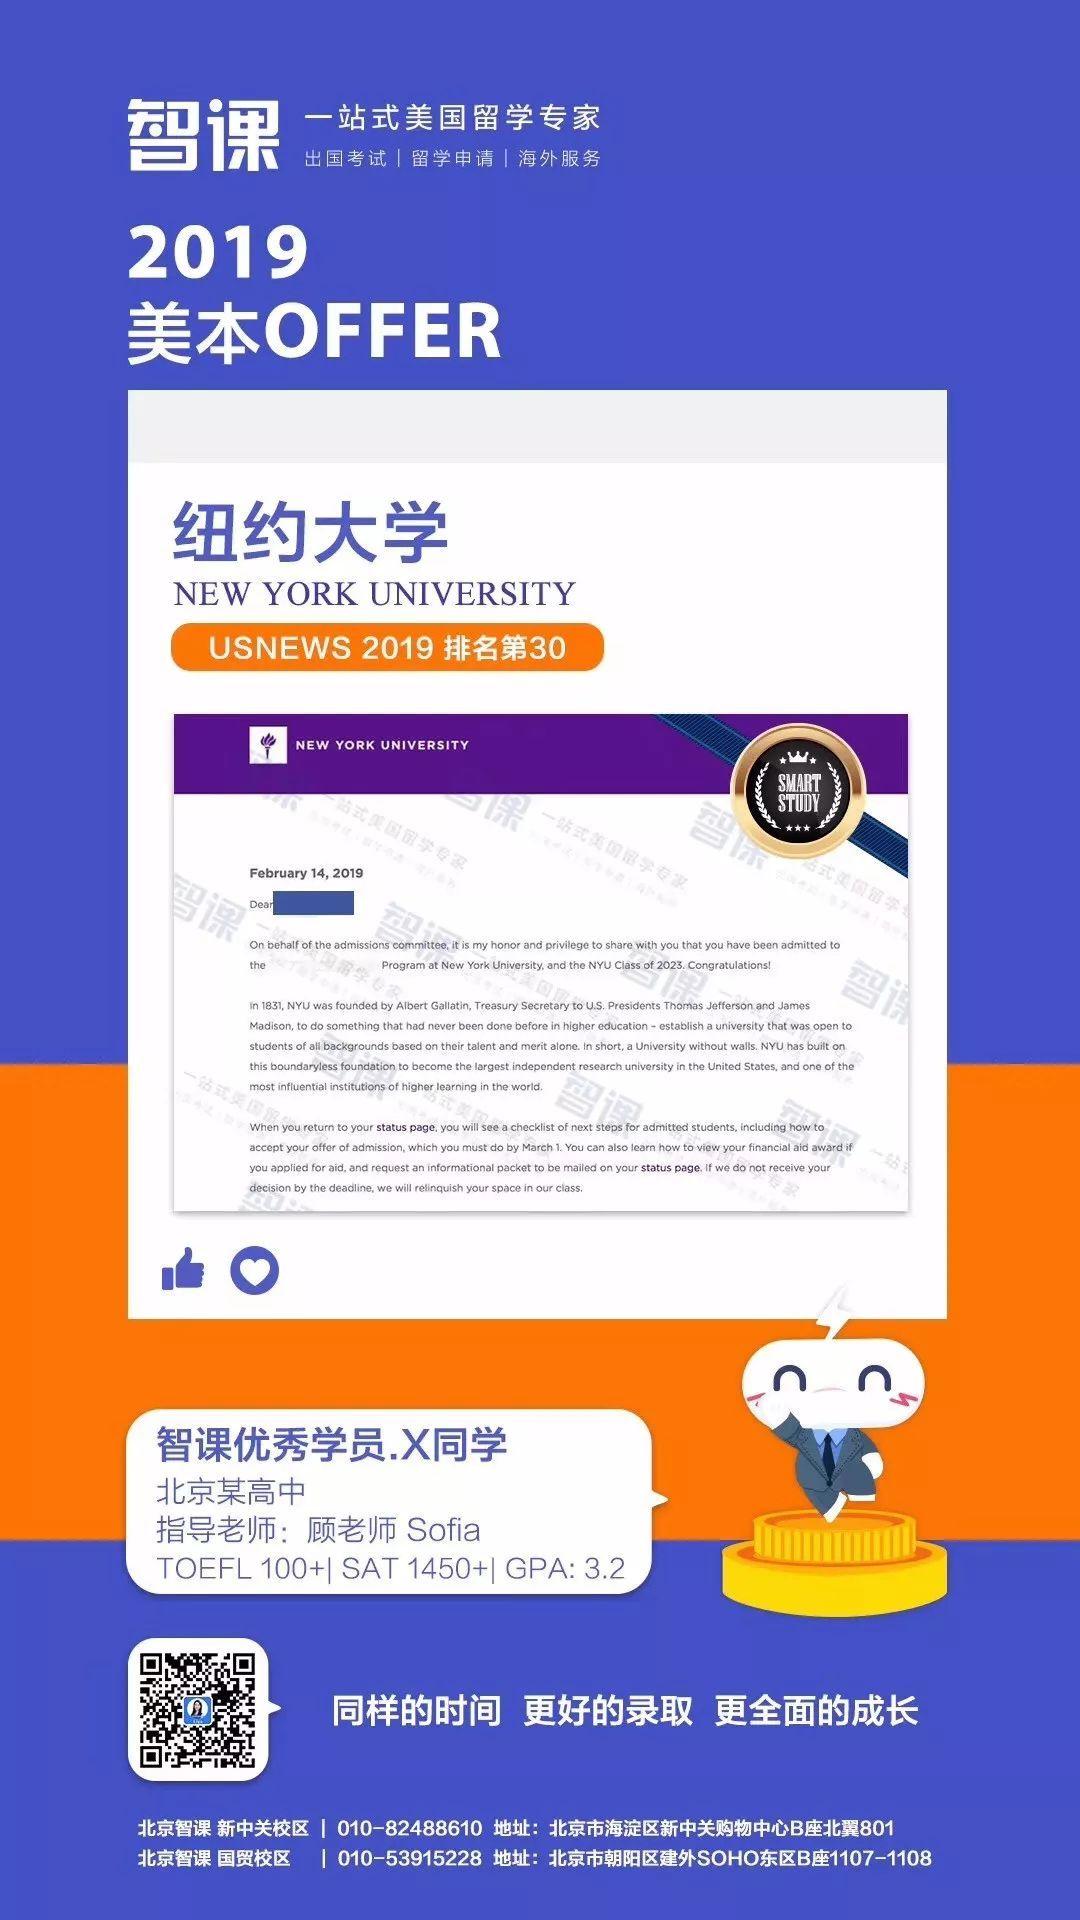 Offer捷报丨恭喜小伙伴斩获纽约大学录取!